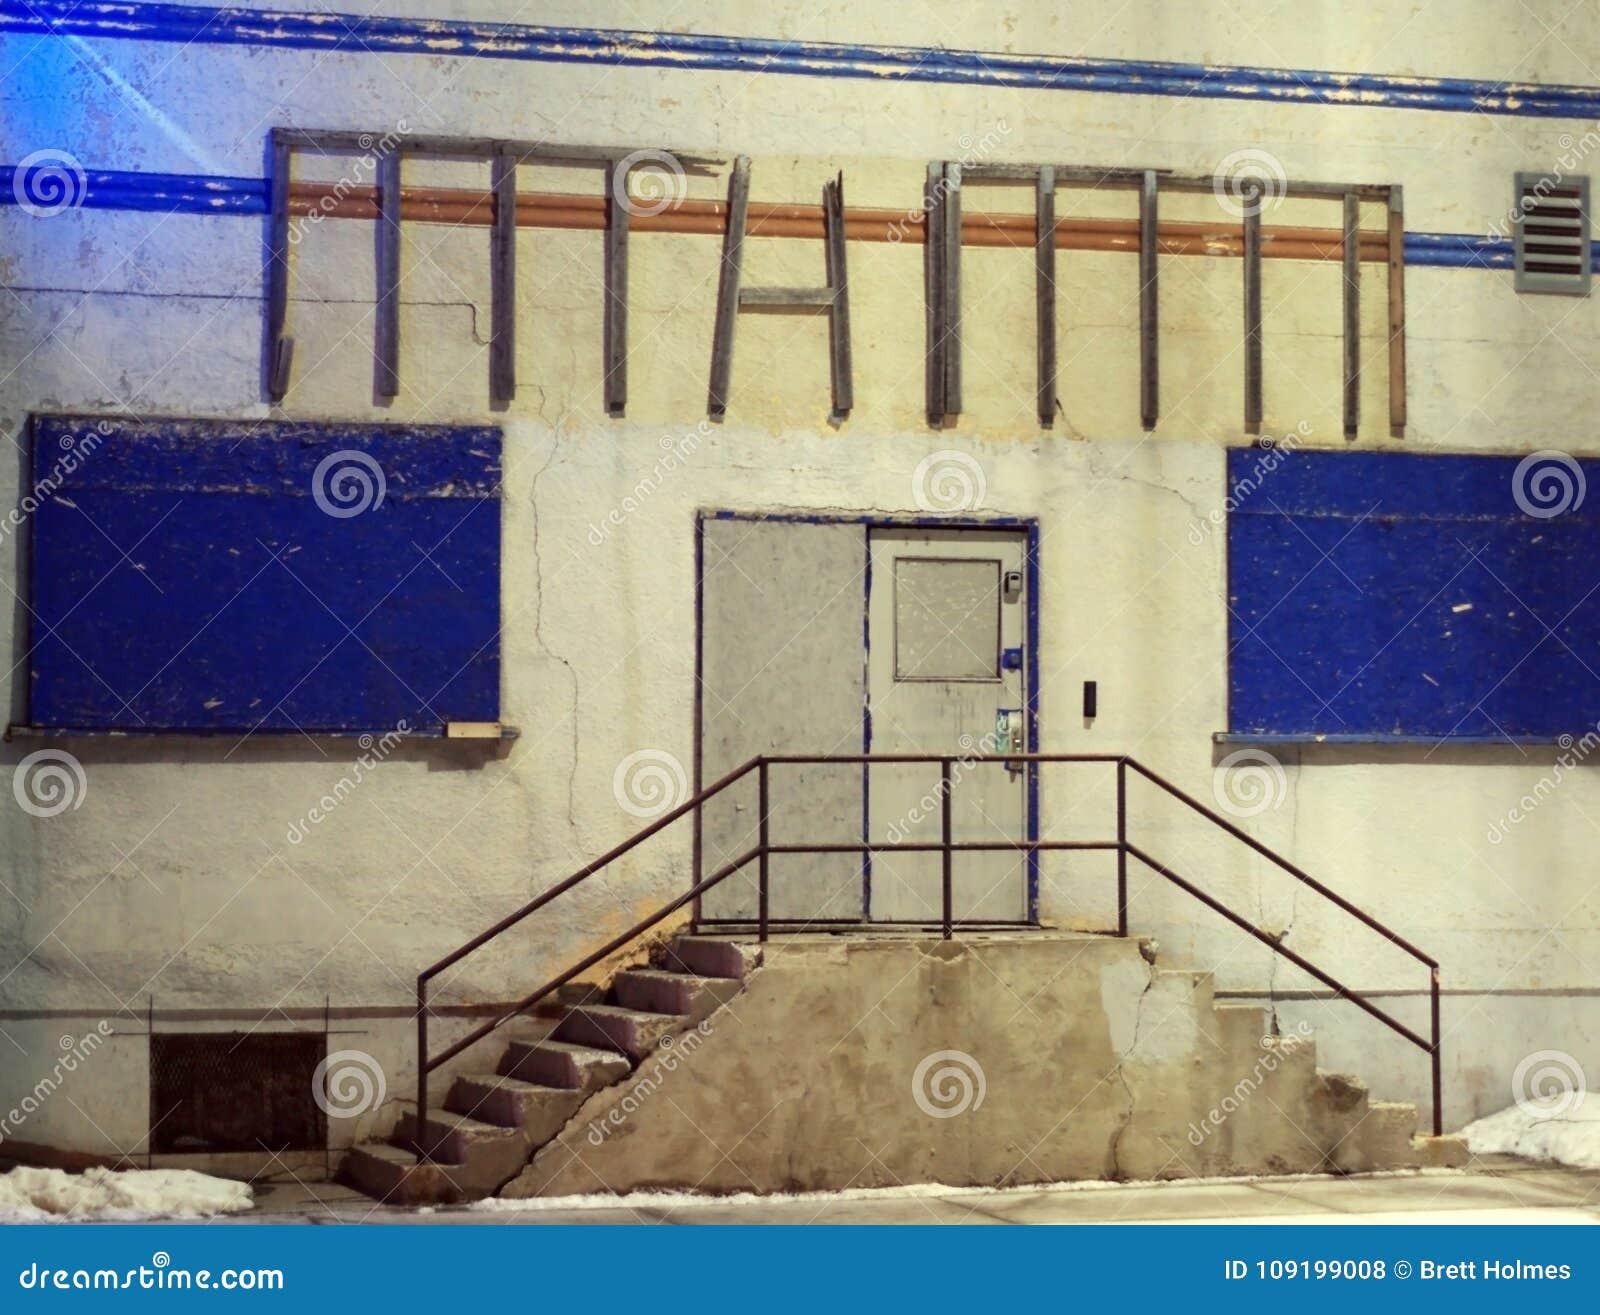 Garage Entrance At Night Stock Image